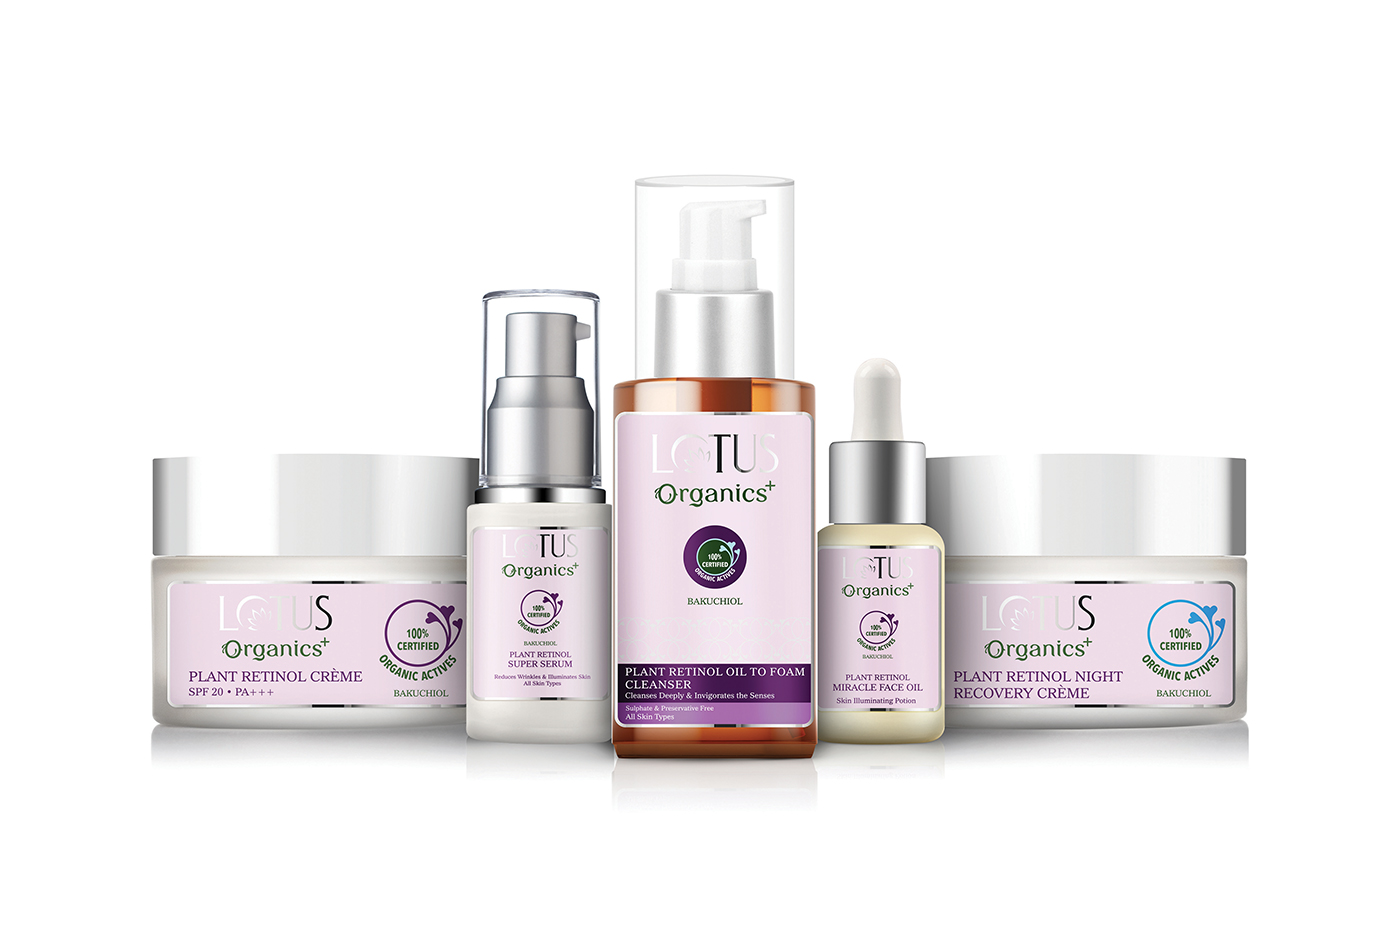 Lotus Organics+ launches Bakuchiol skincare range